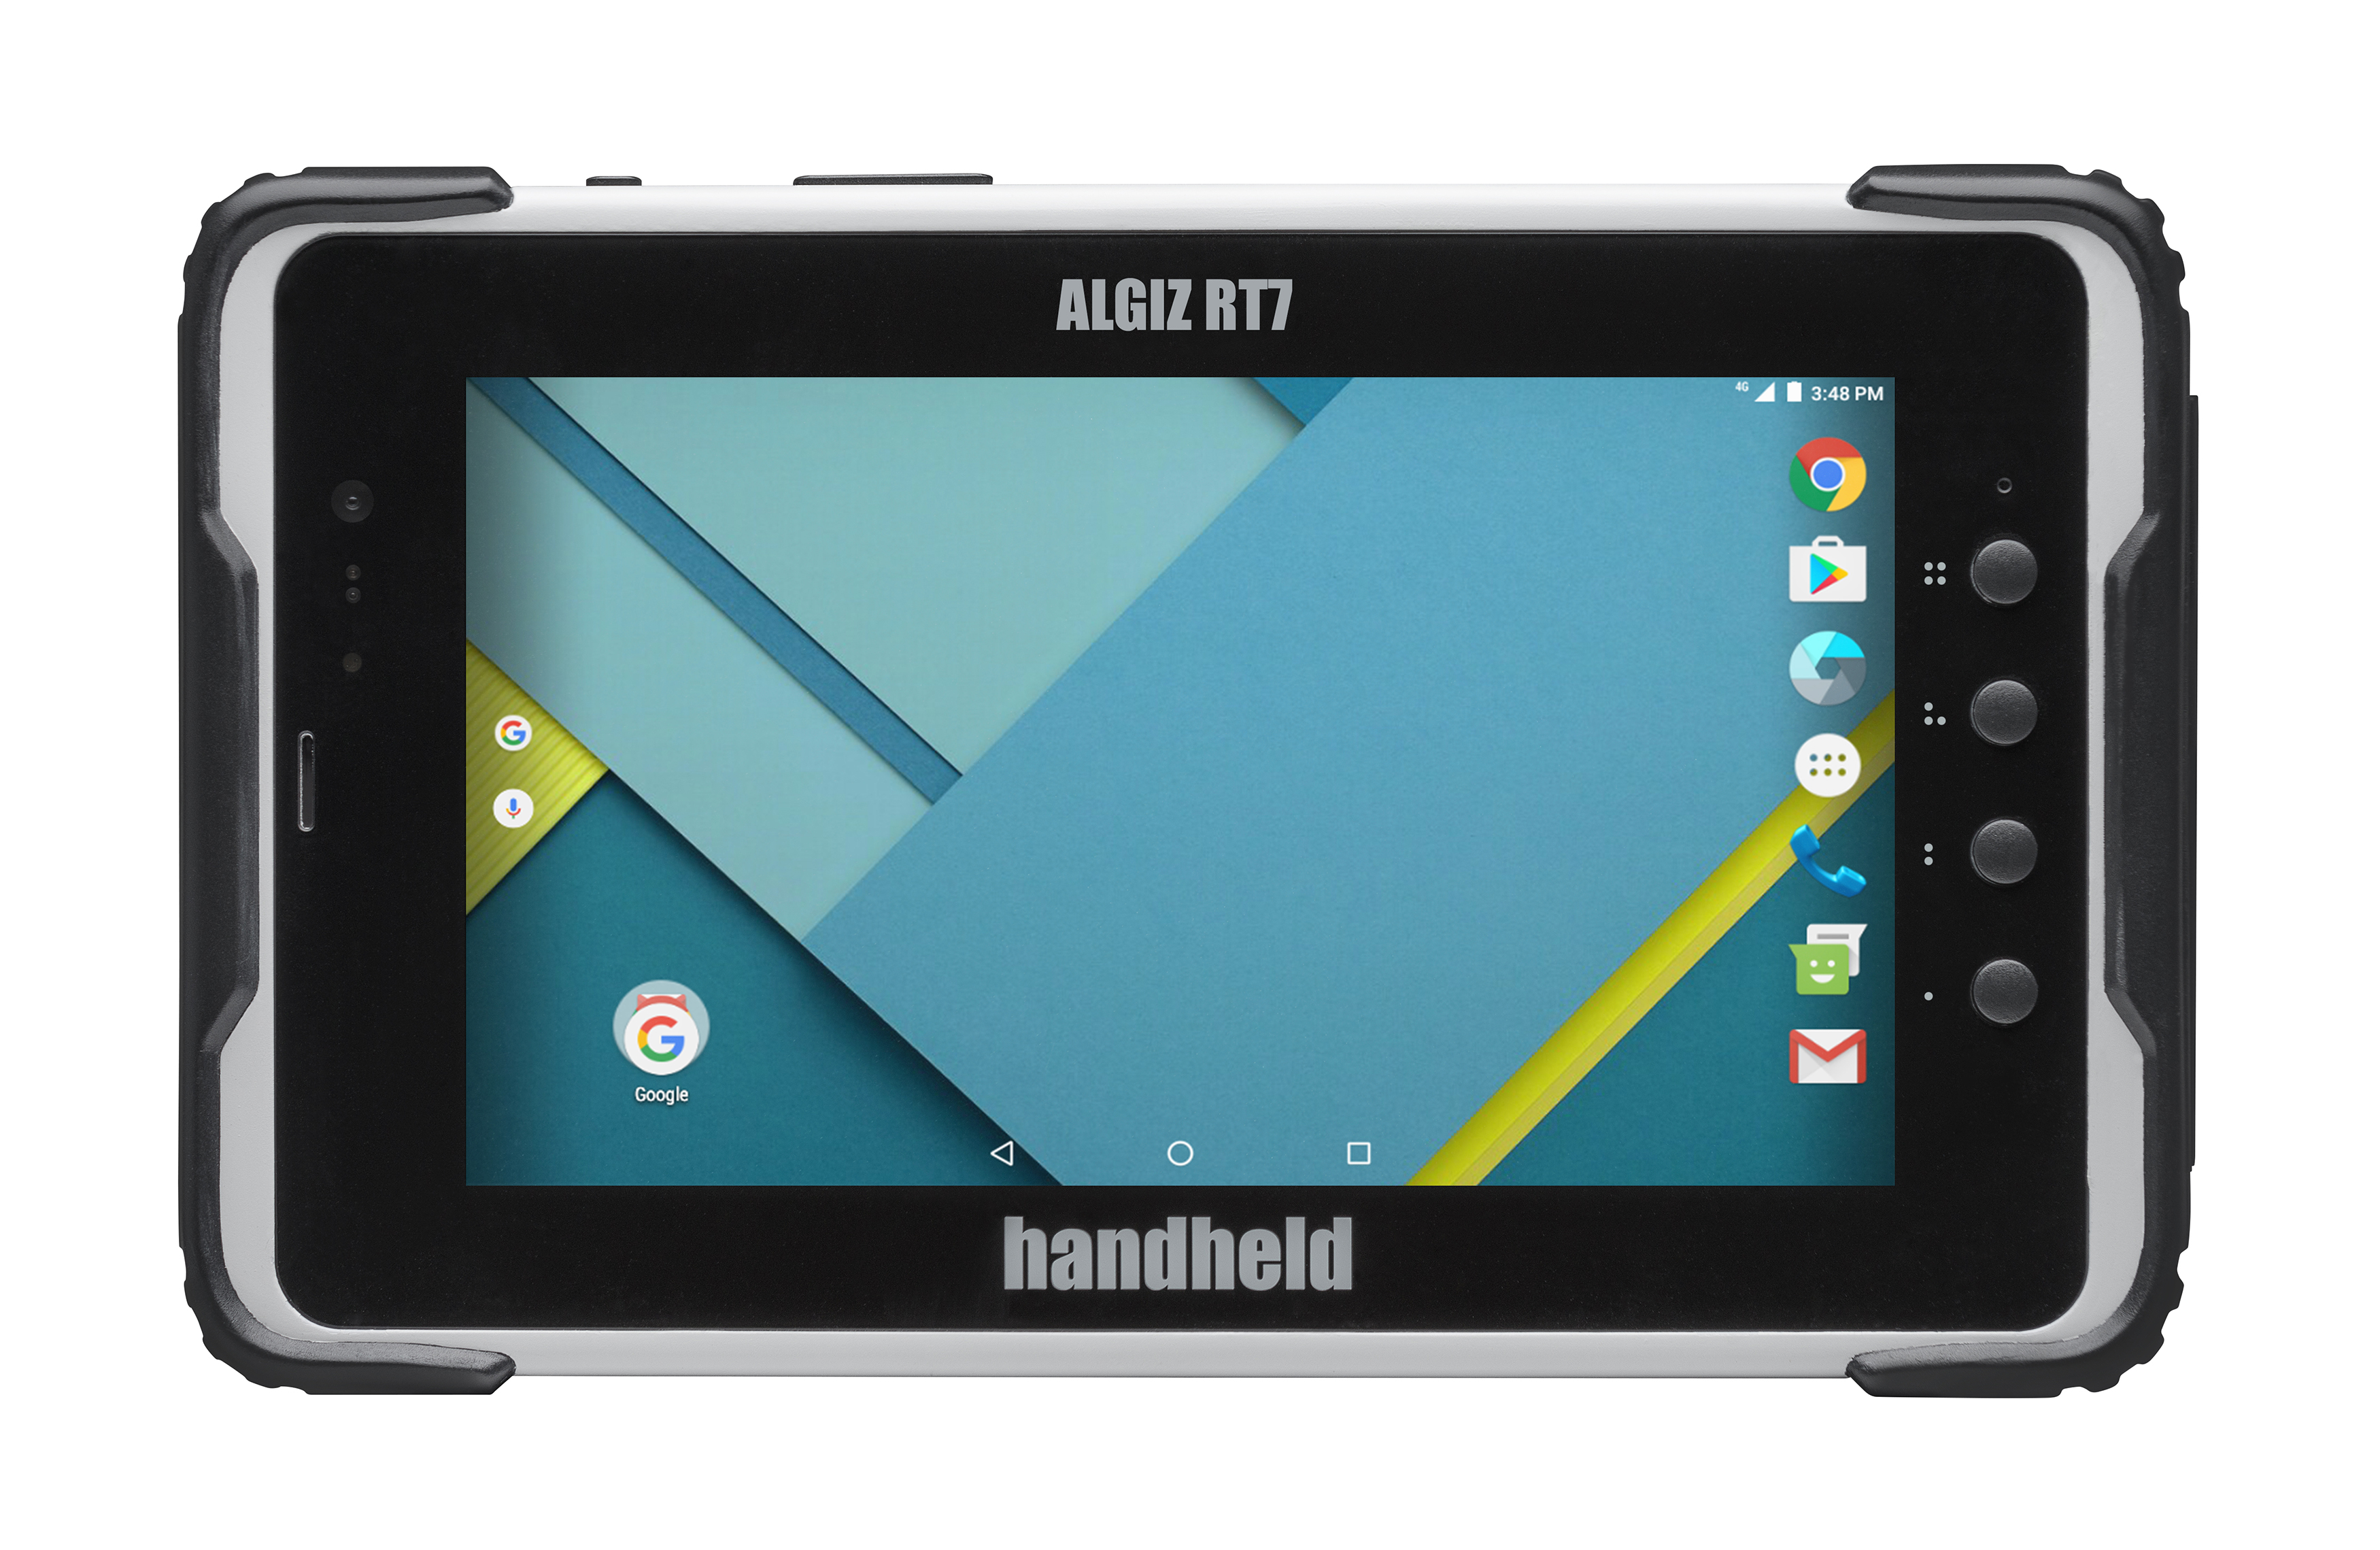 Handheld ALGIZ RT7 eTicket